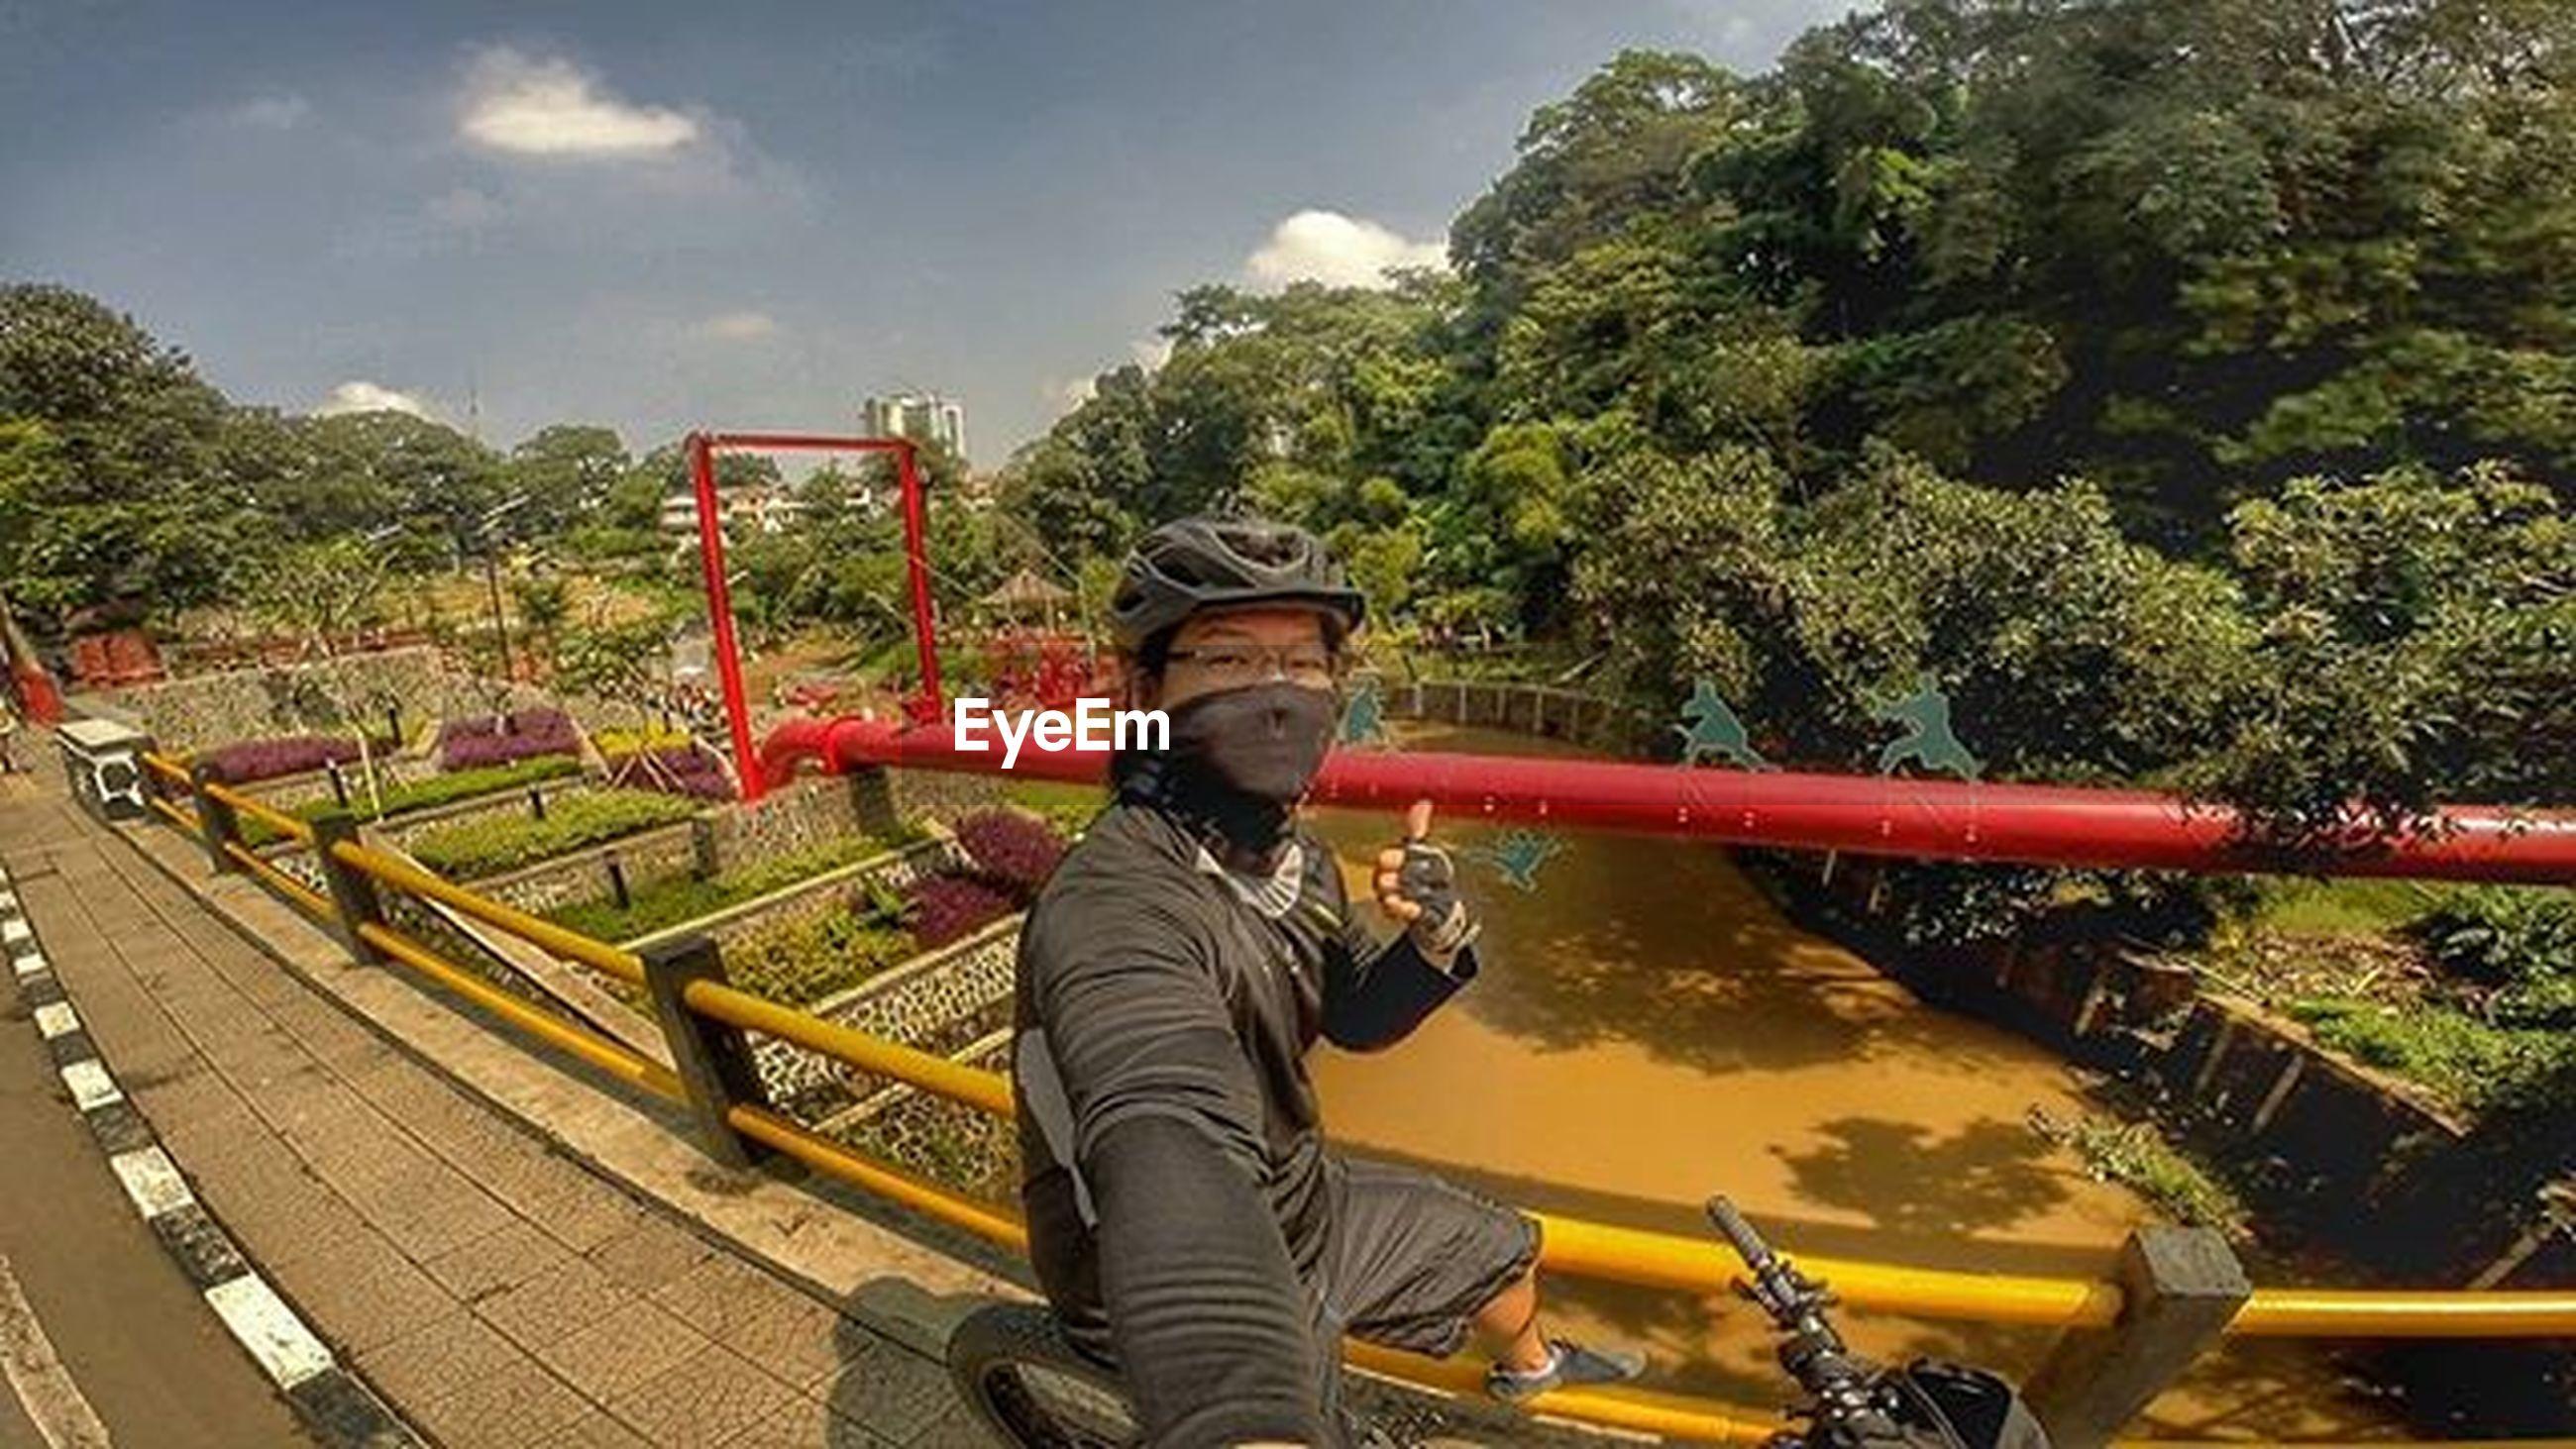 Park River Bike Bicycle Fatbike United Grind Fatbikeworld Val  2016 Gopro Gopro3plus Goproblackedition Goproeverything Gopro4life Gopro_moment Goprooftheday Gopromoment 😚 Bandung Bandungjuara